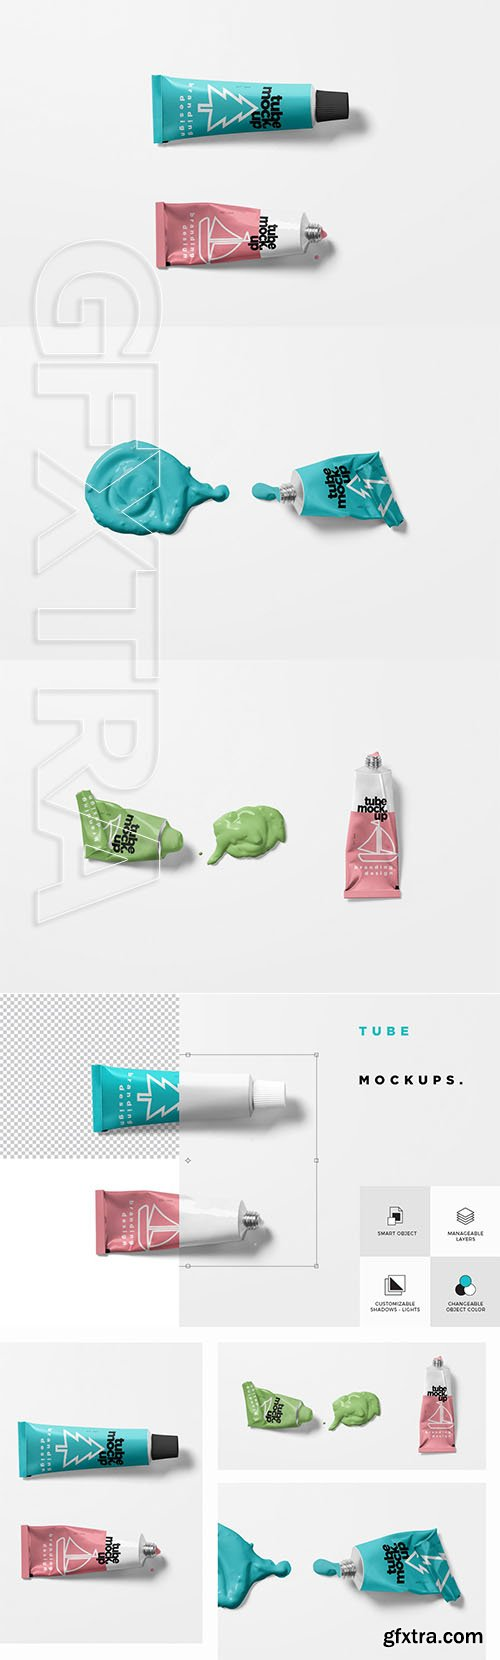 CreativeMarket - Paint Tube Mockups 3525407